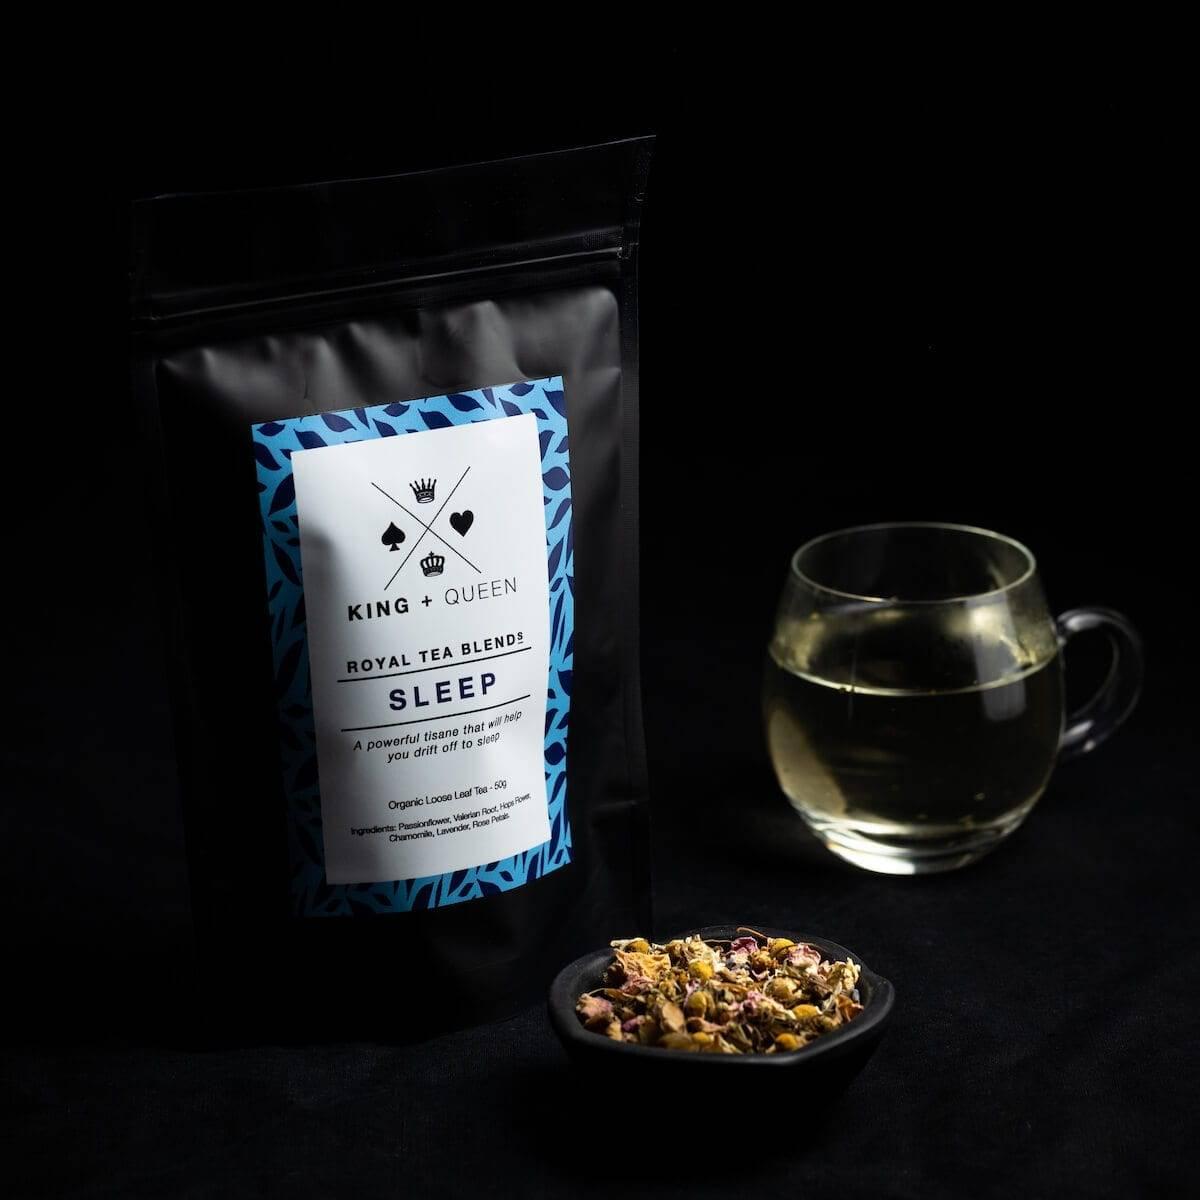 Sleep Tea - Bedtime Tea